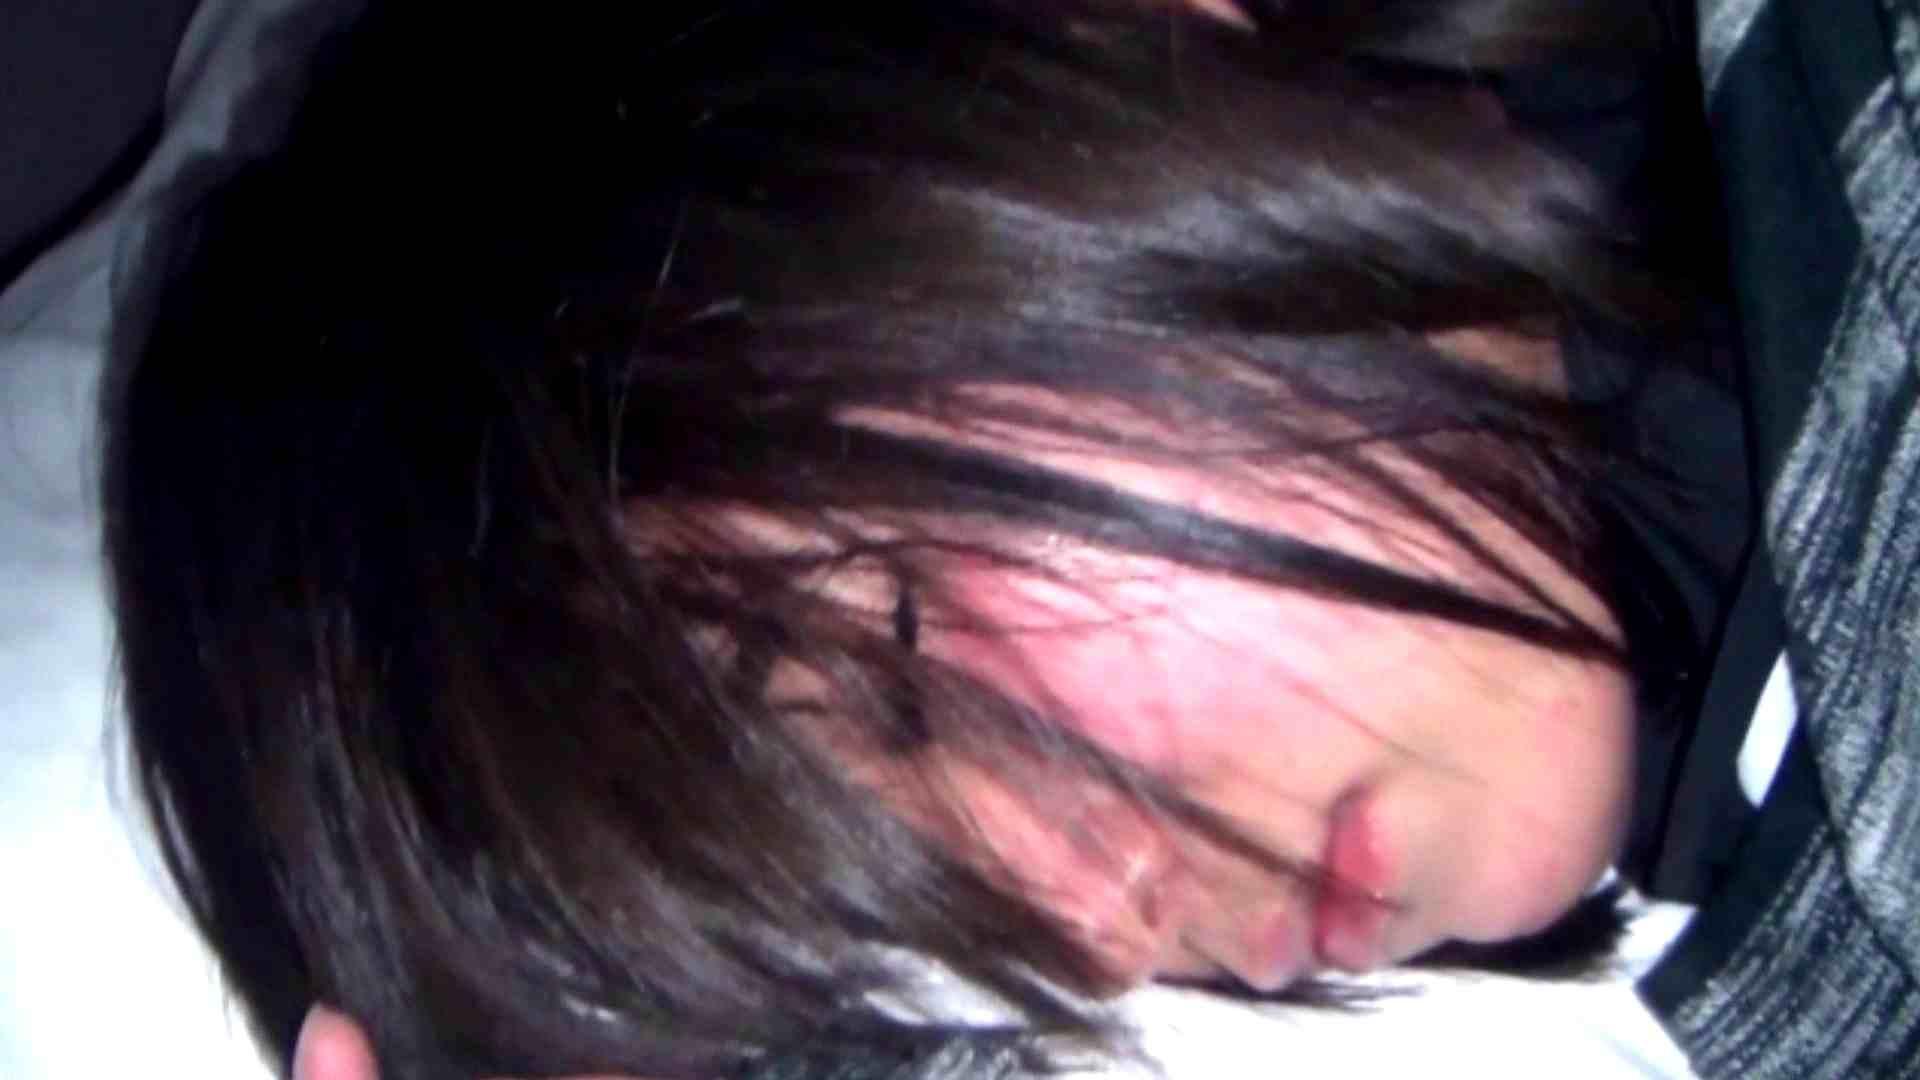 vol.34 【AIちゃん】 黒髪19歳 夏休みのプチ家出中 1回目 細身   チラ  56画像 14